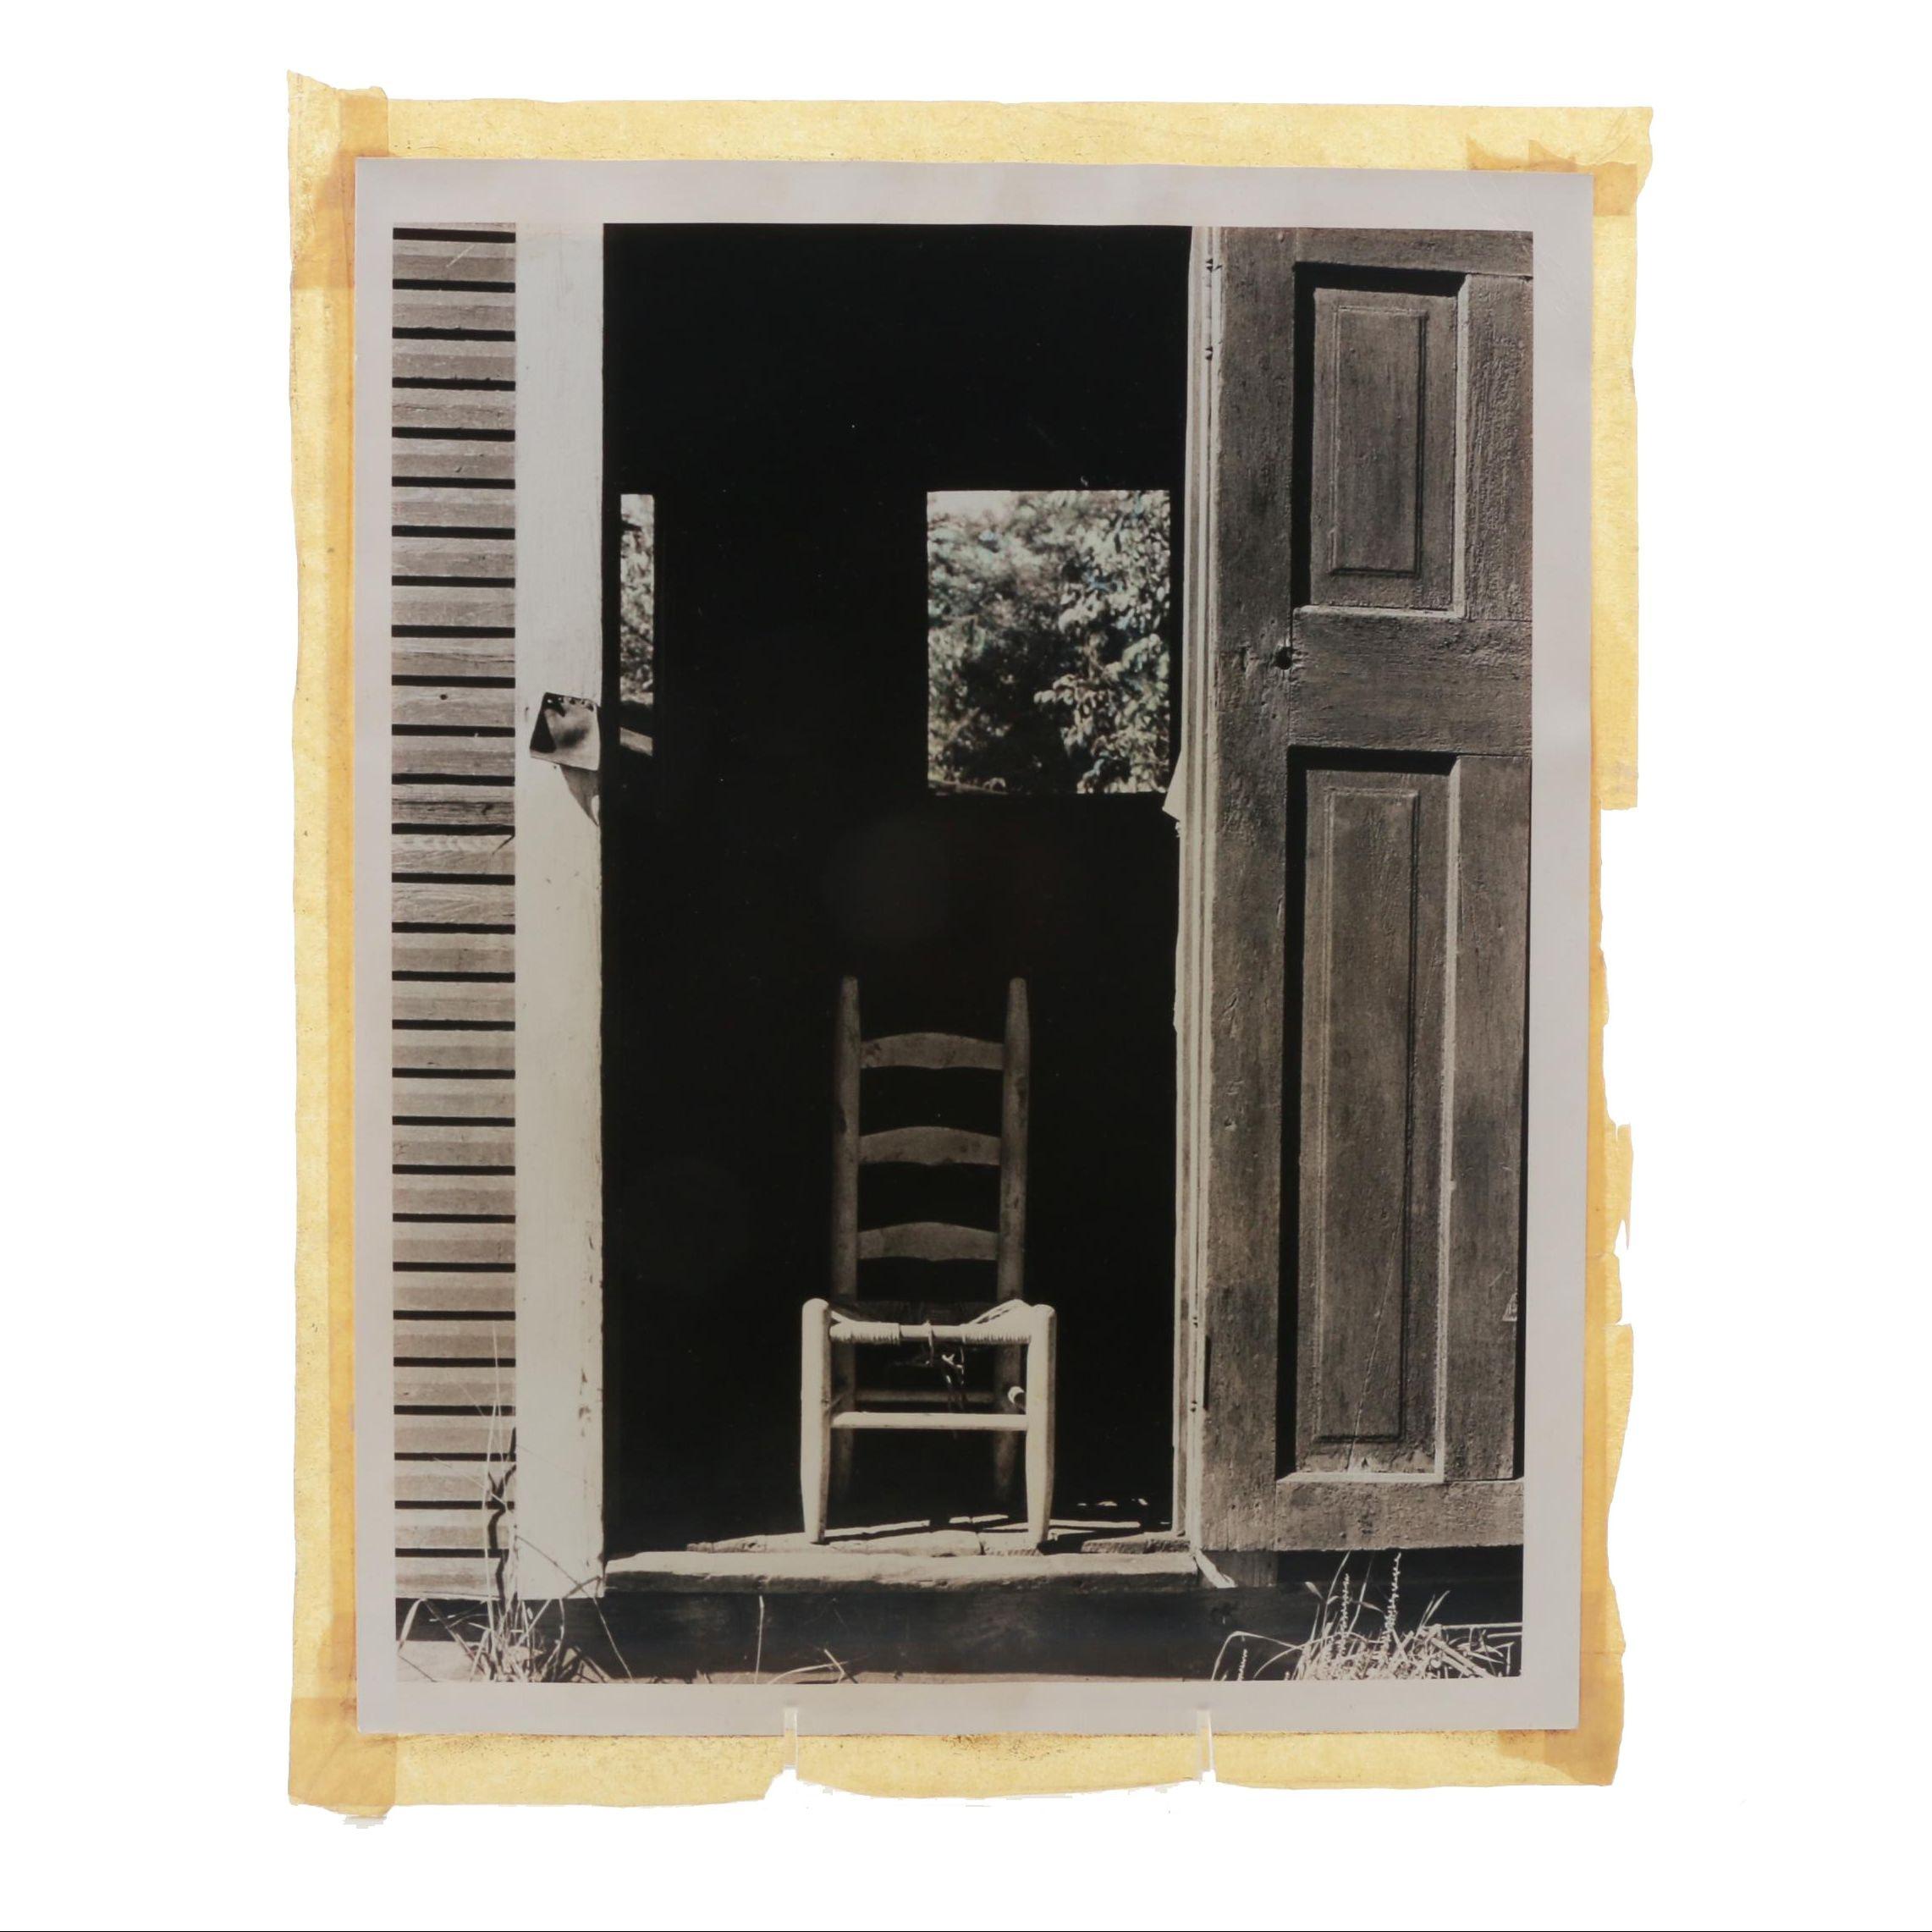 Circa 1950s Black and White Photograph